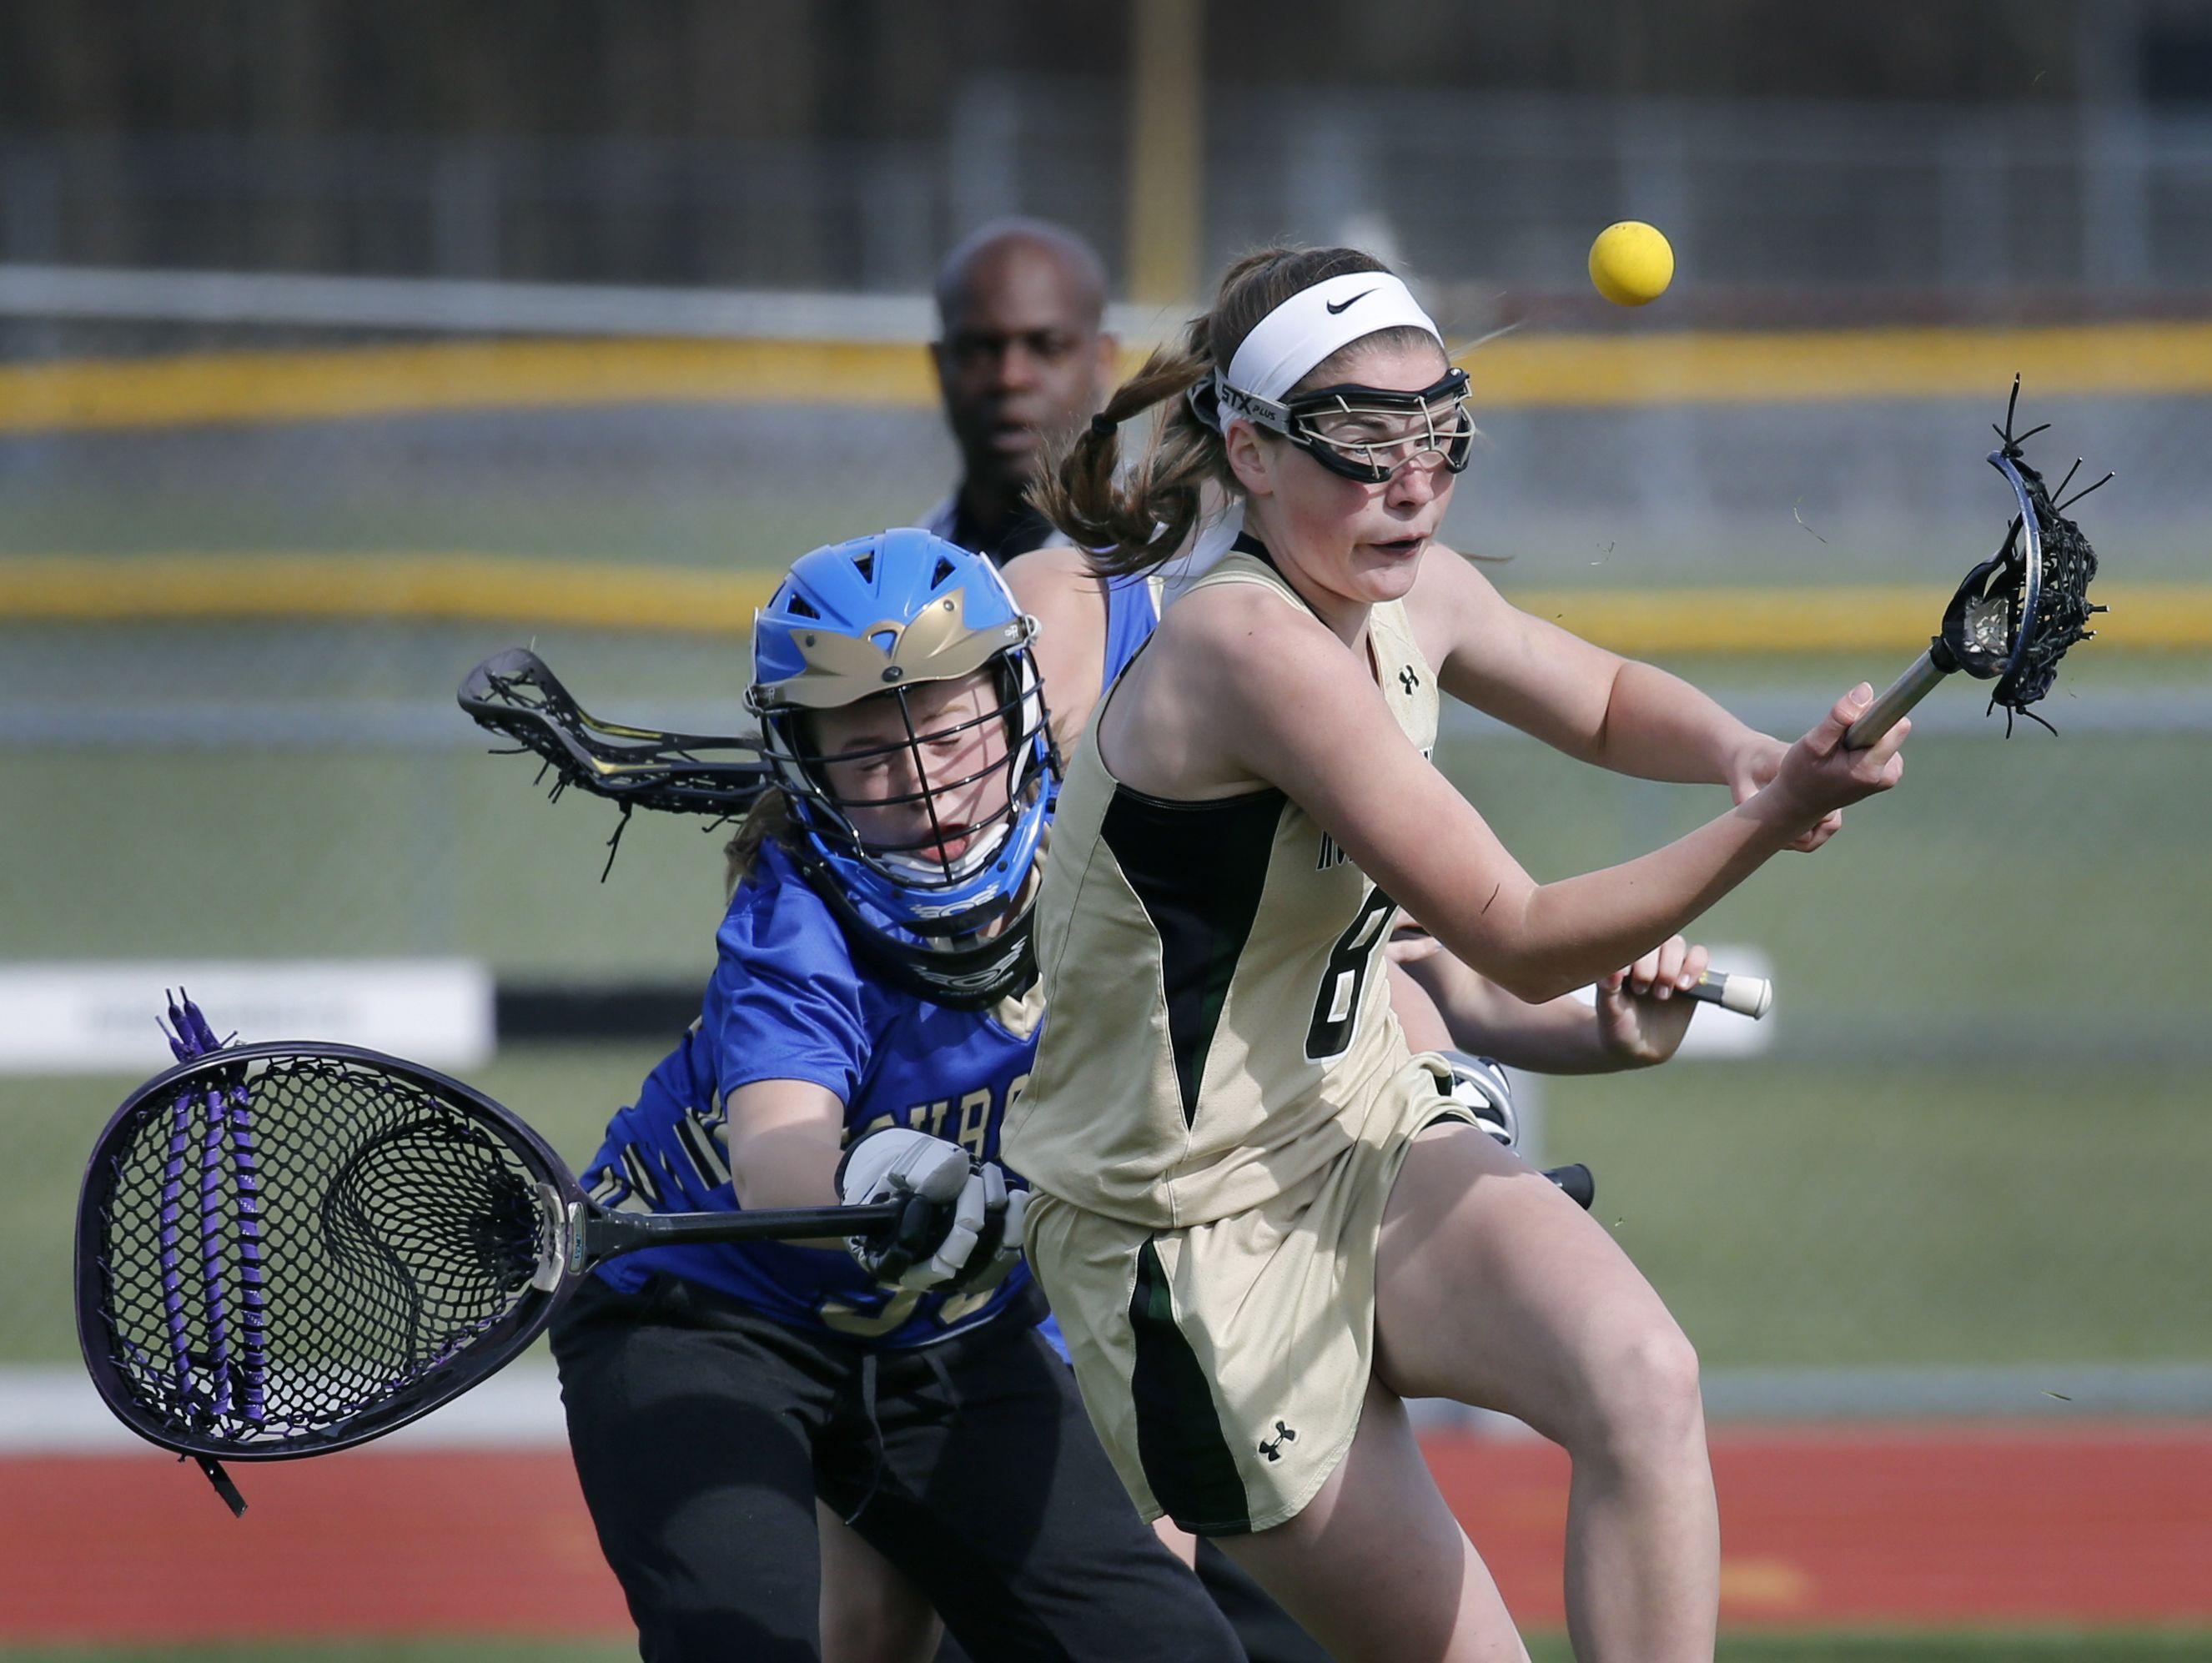 Rush-Henrietta's Rachel Crane controls the ball before scoring for a 2-0 lead against Webster Schroeder goalie Jorden Concordia in the first half at Rush-Henrietta High School.